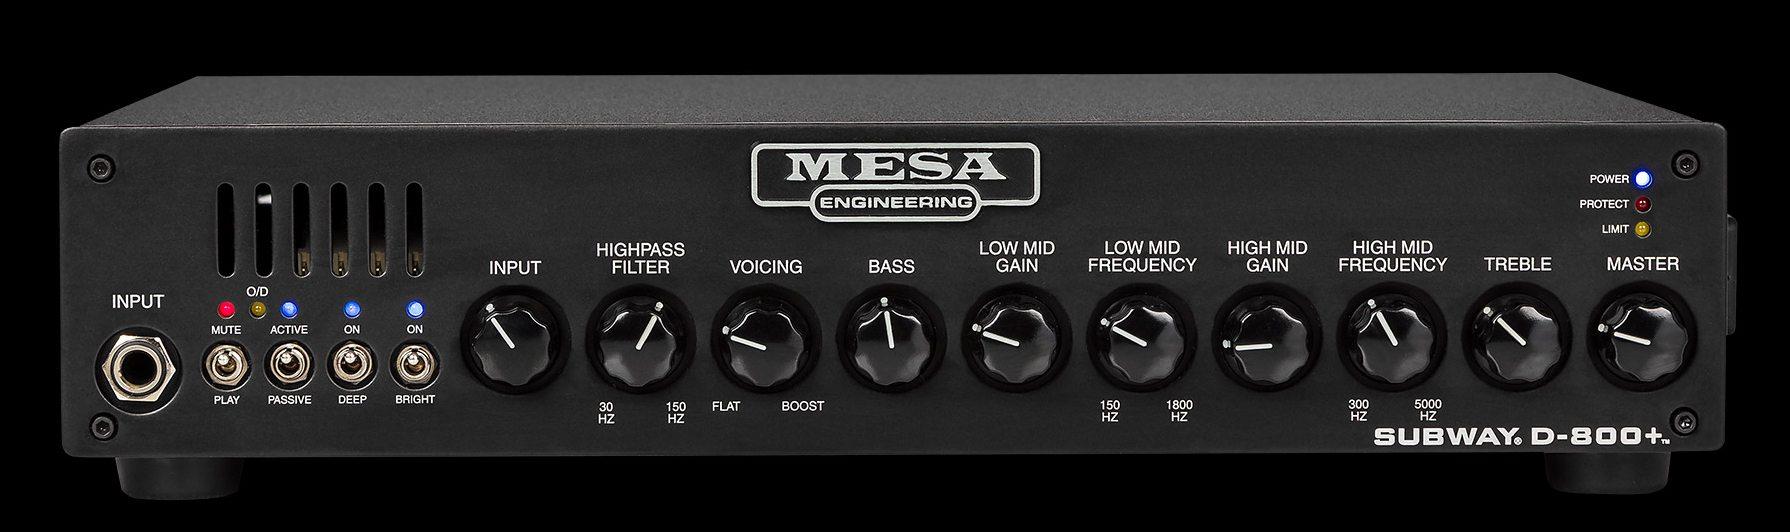 Mesa Boogie Subway D-800 +